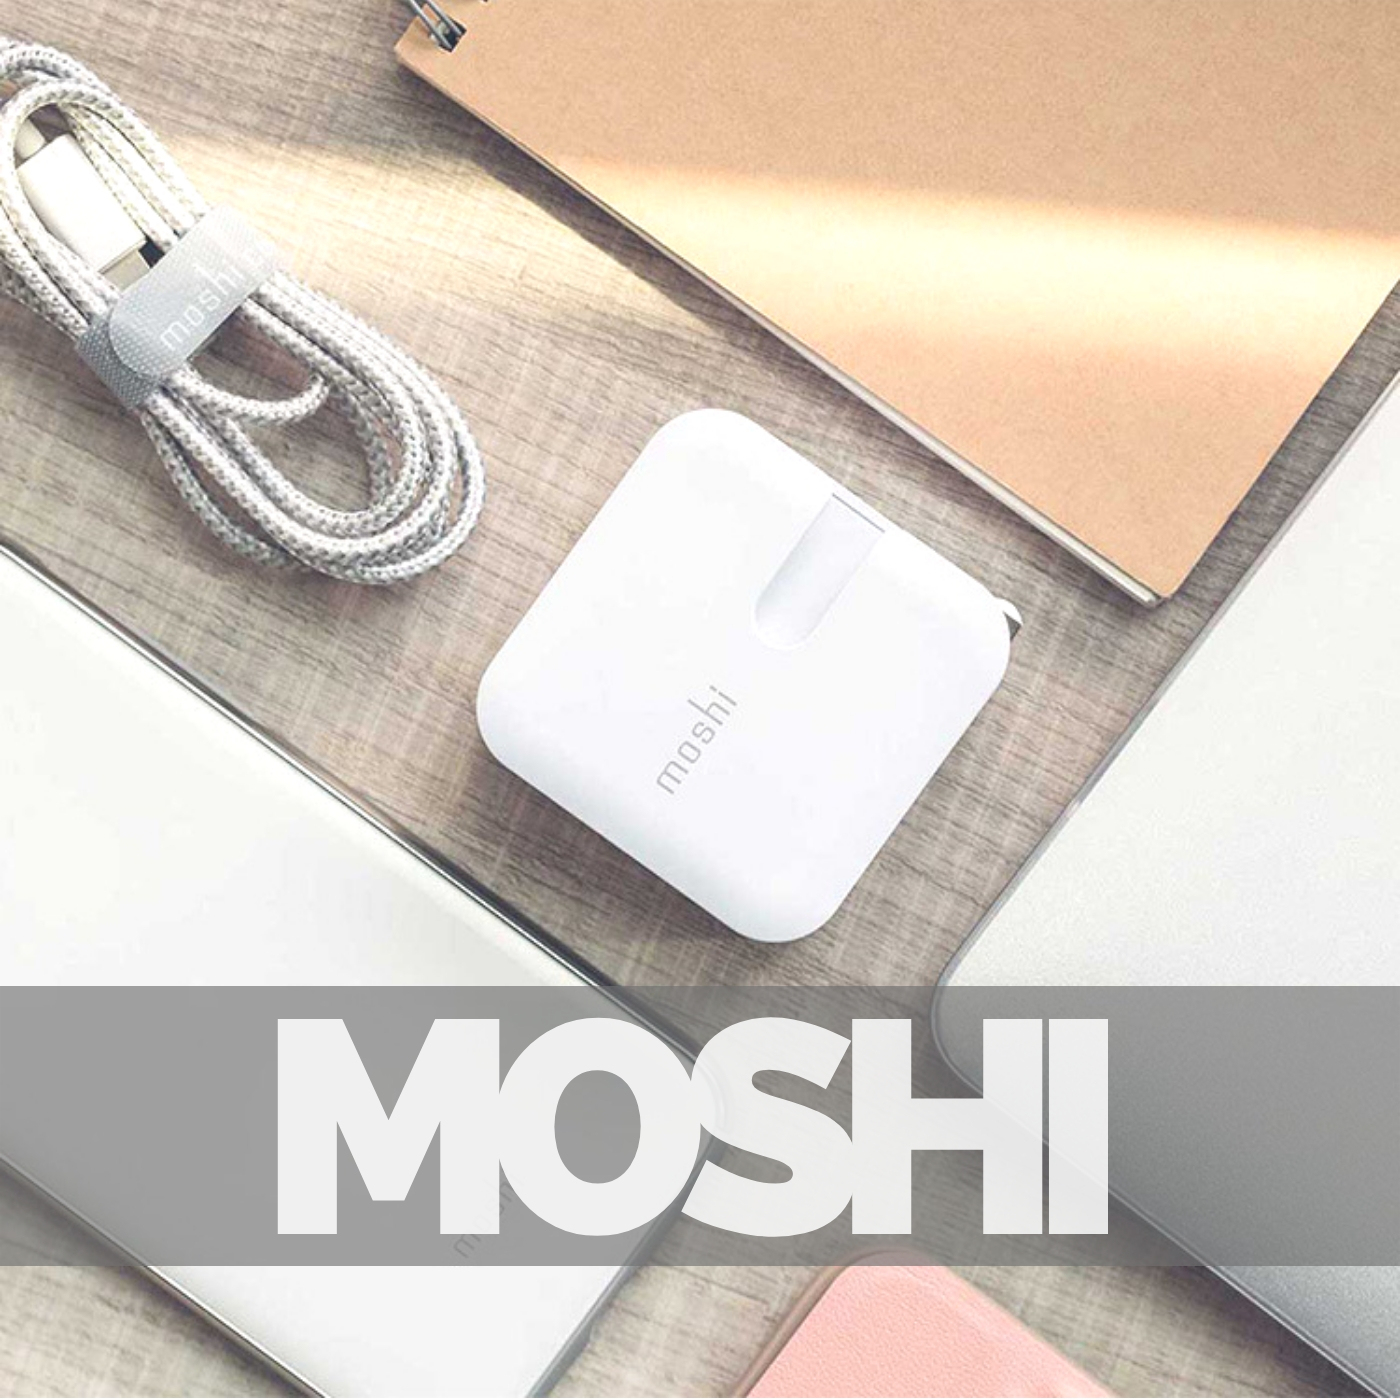 moshi 全系列|美國獨創品牌・每個細節都精挑細琢